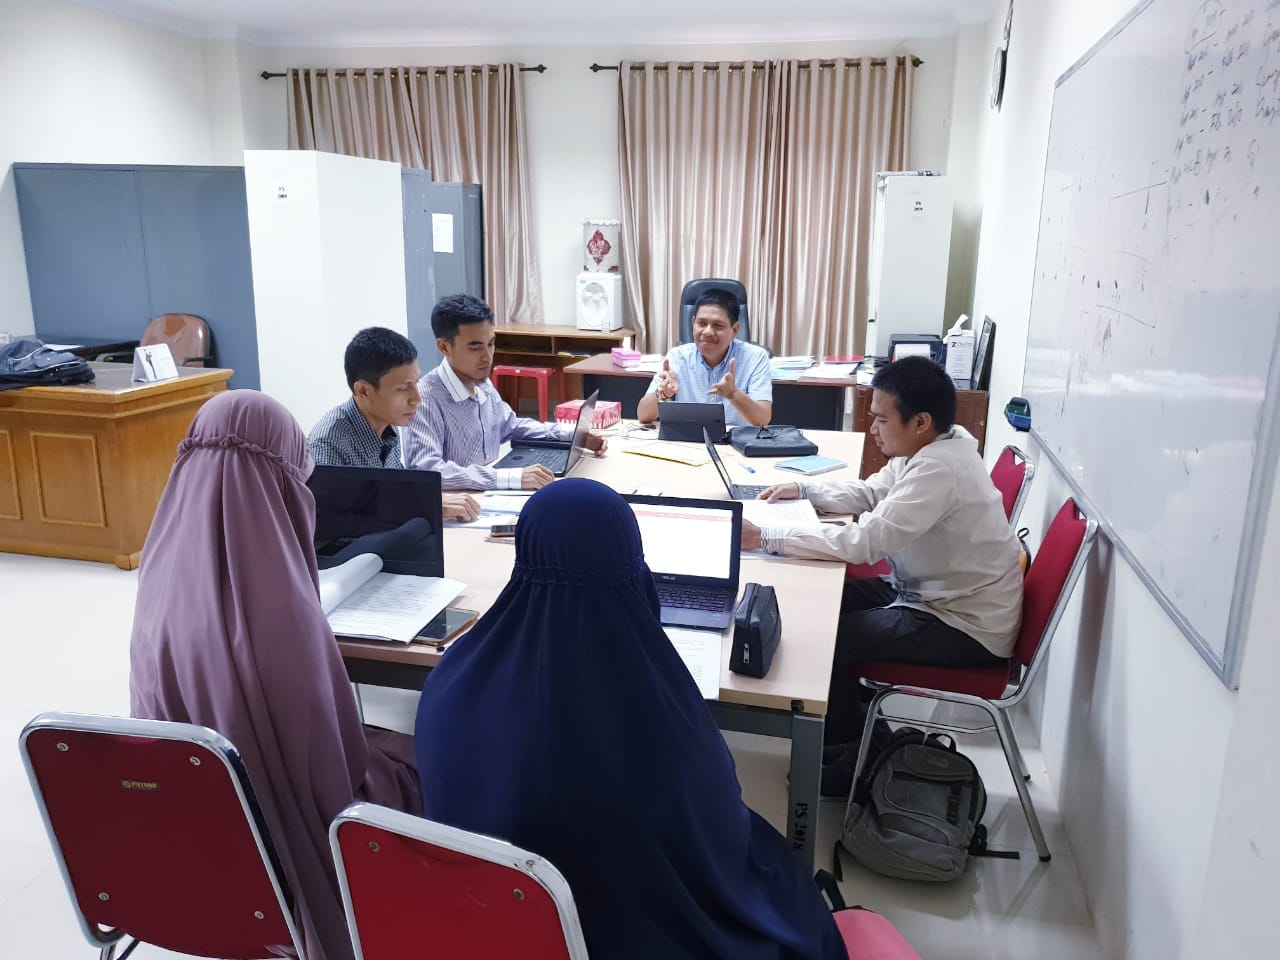 Kuliah Ulumul Qur'an bersama Prof. Dr. Achmad Abubakar, M.Ag.